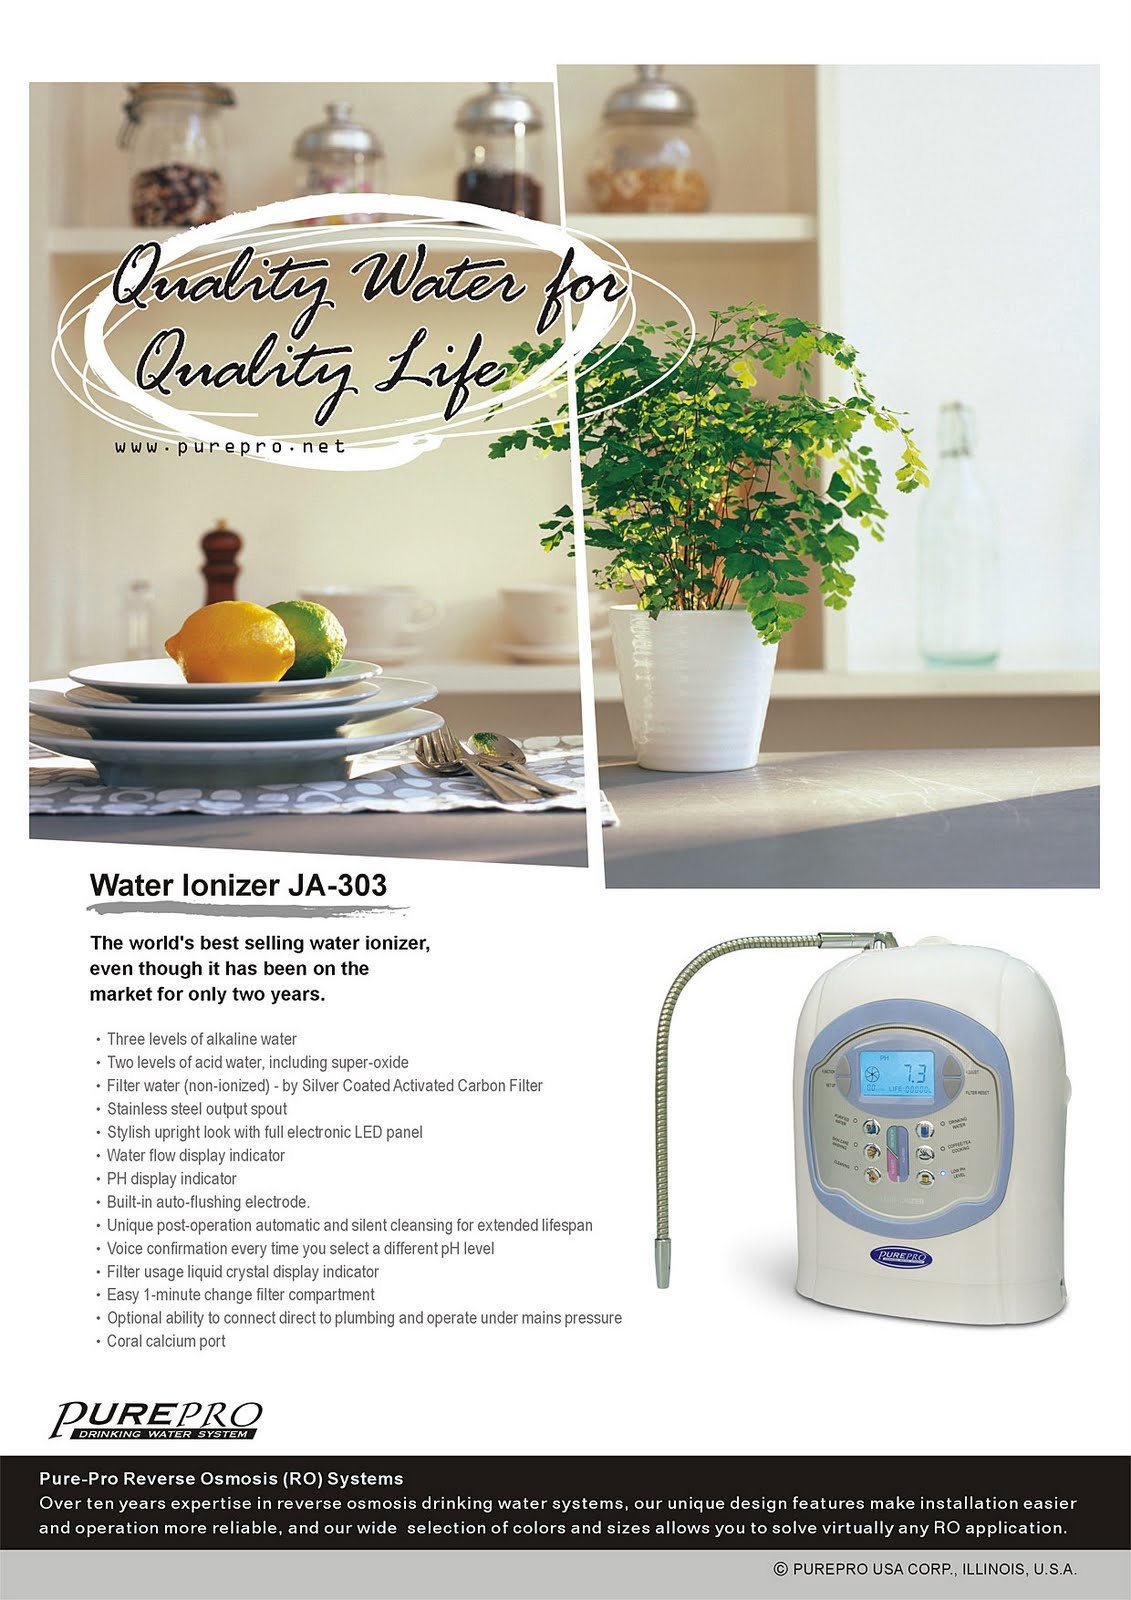 PurePro USA Water Ionizer JA-303